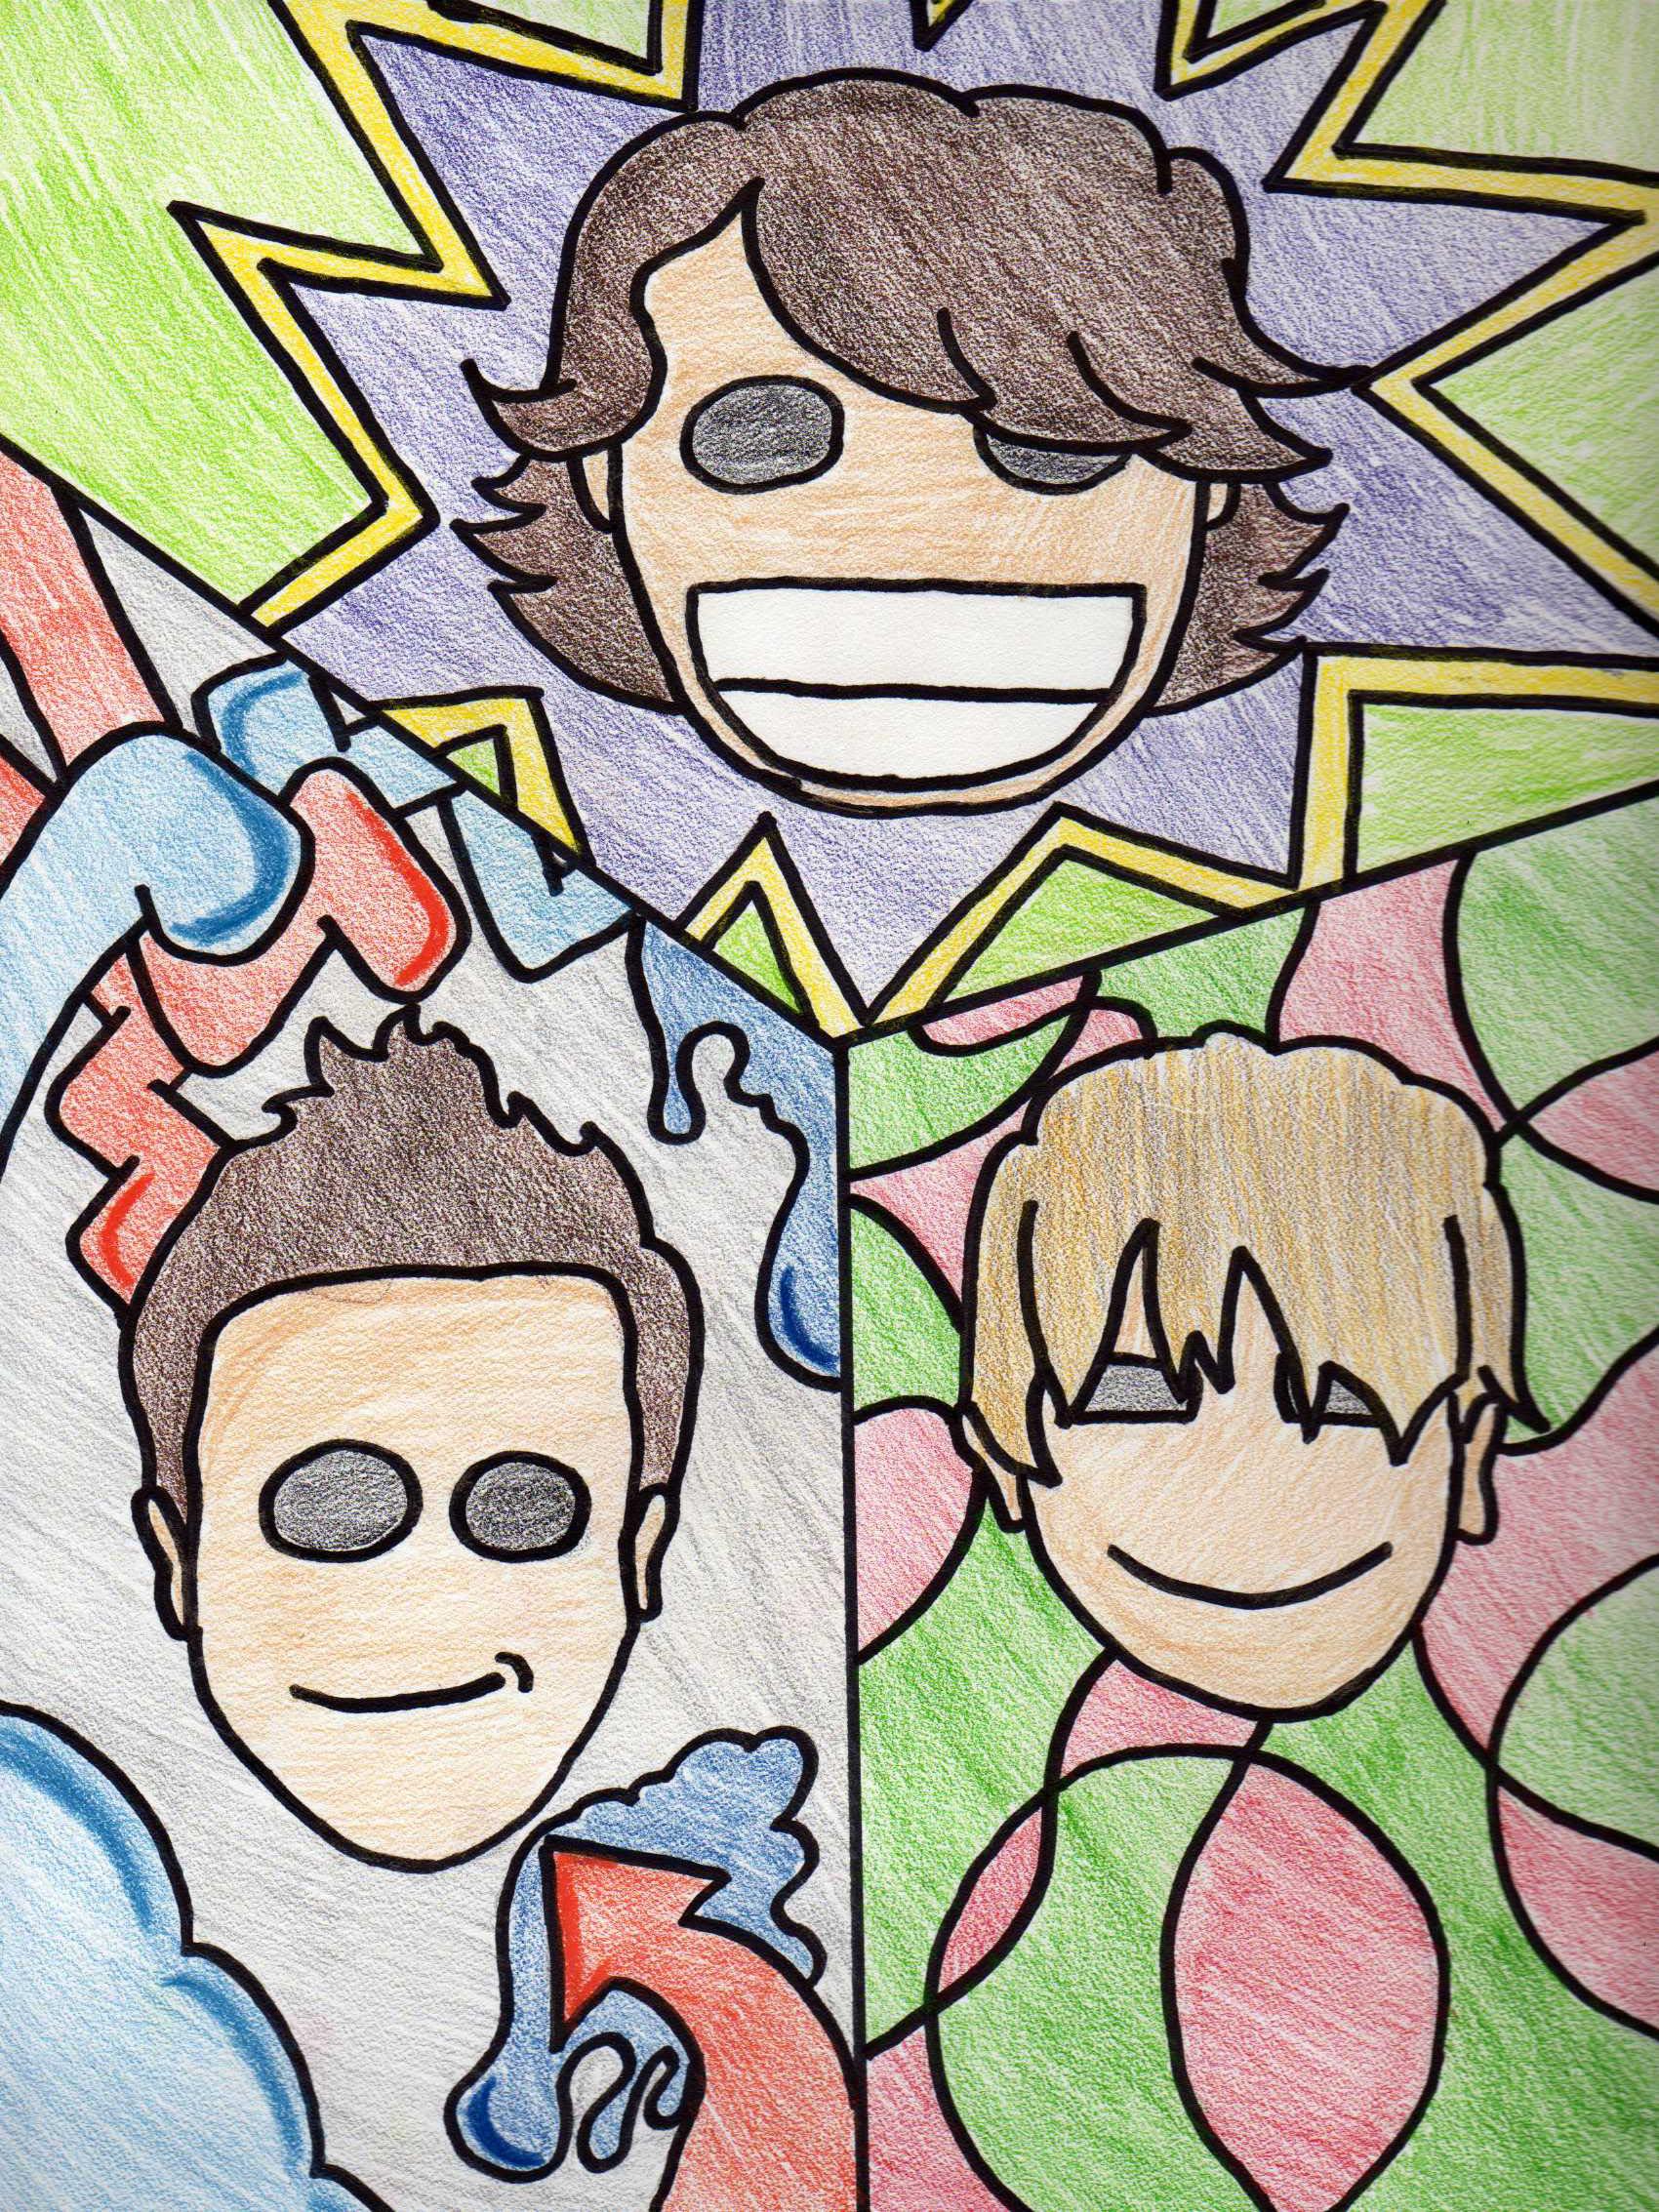 The Trimascular Trio